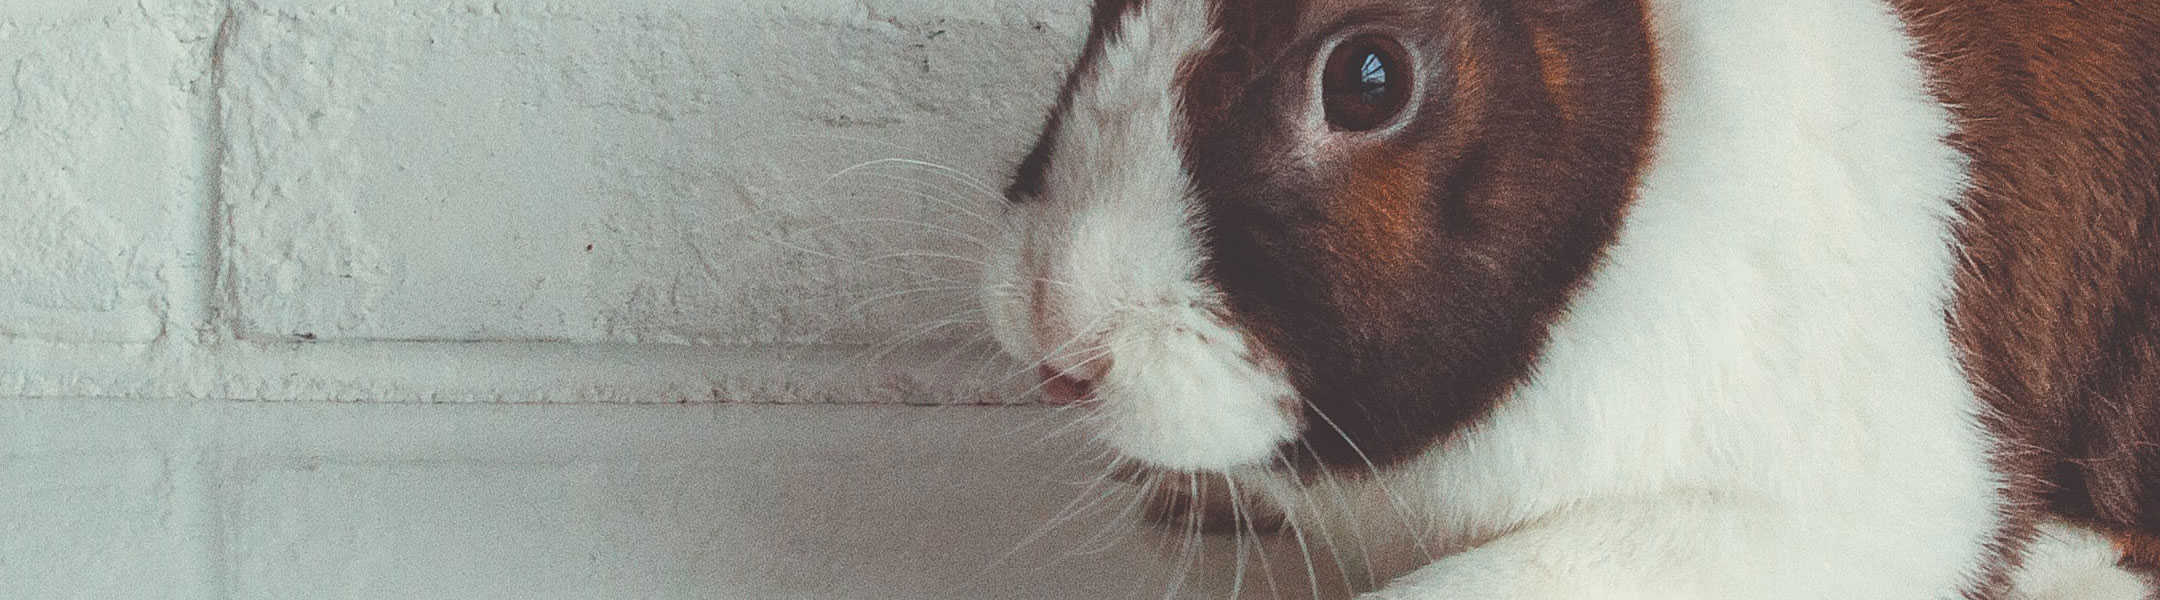 Companies That Test On Animals 20 Update   Cruelty Free Kitty